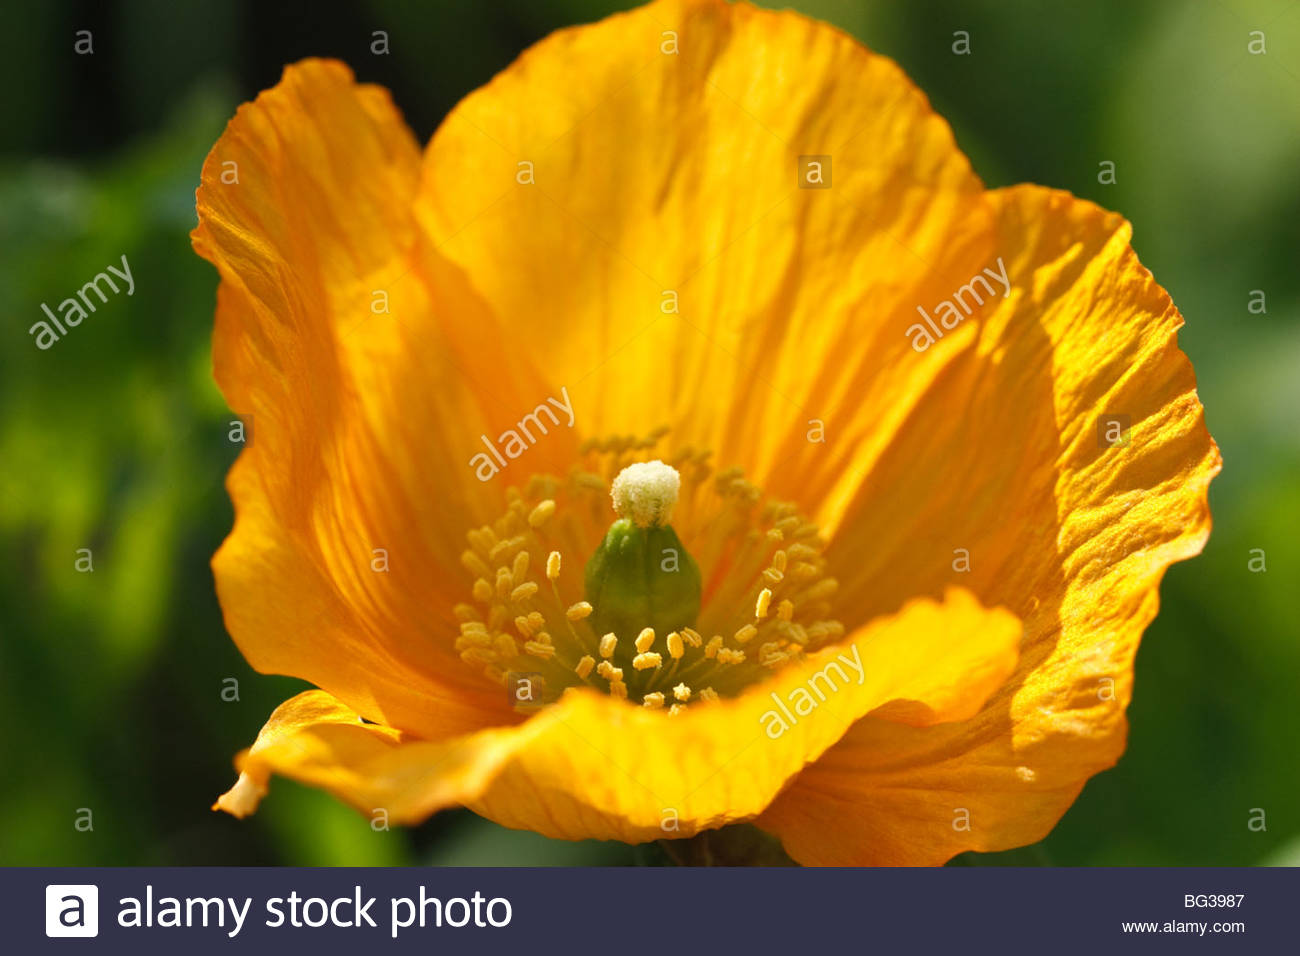 Poppy Flower Stock Photos Poppy Flower Stock Images Alamy